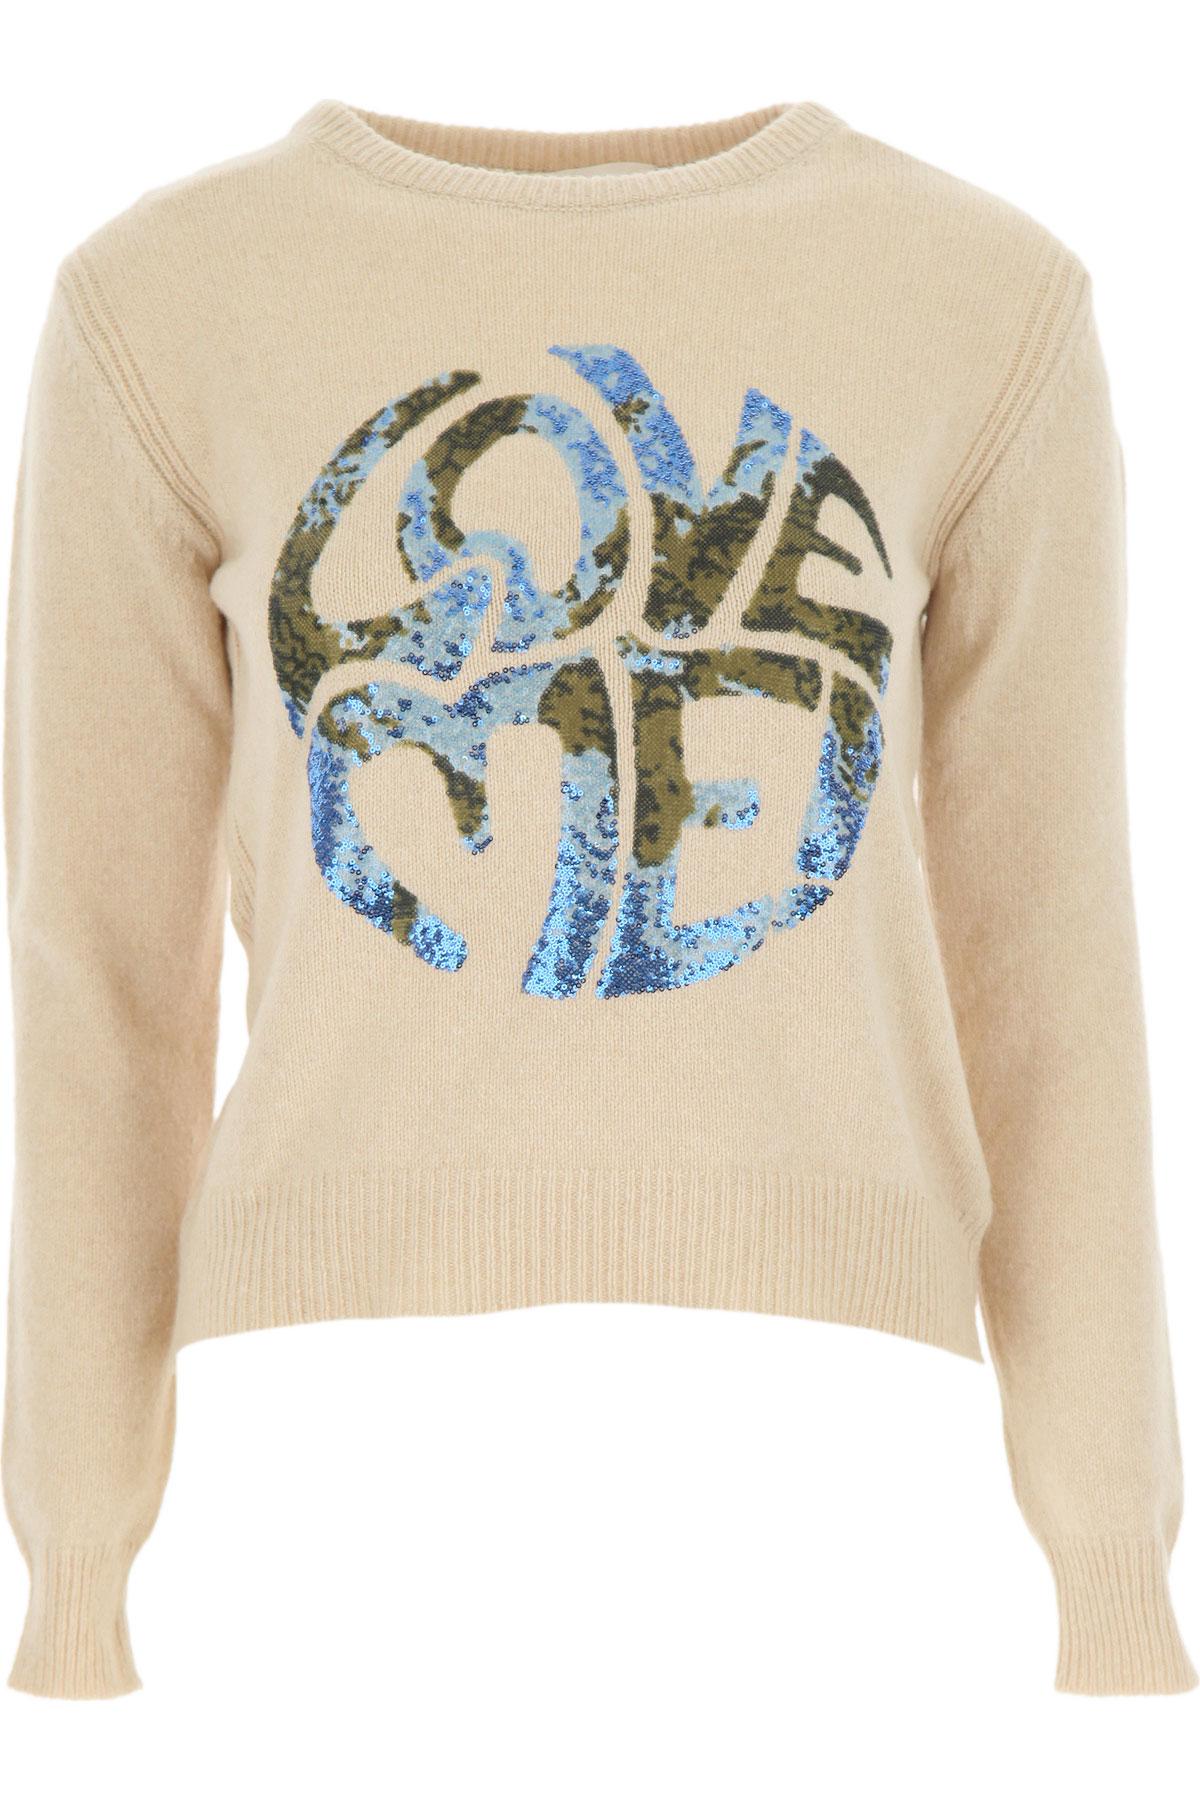 Alberta Ferretti Sweater for Women Jumper On Sale, Natural, Cashemere, 2019, 4 8